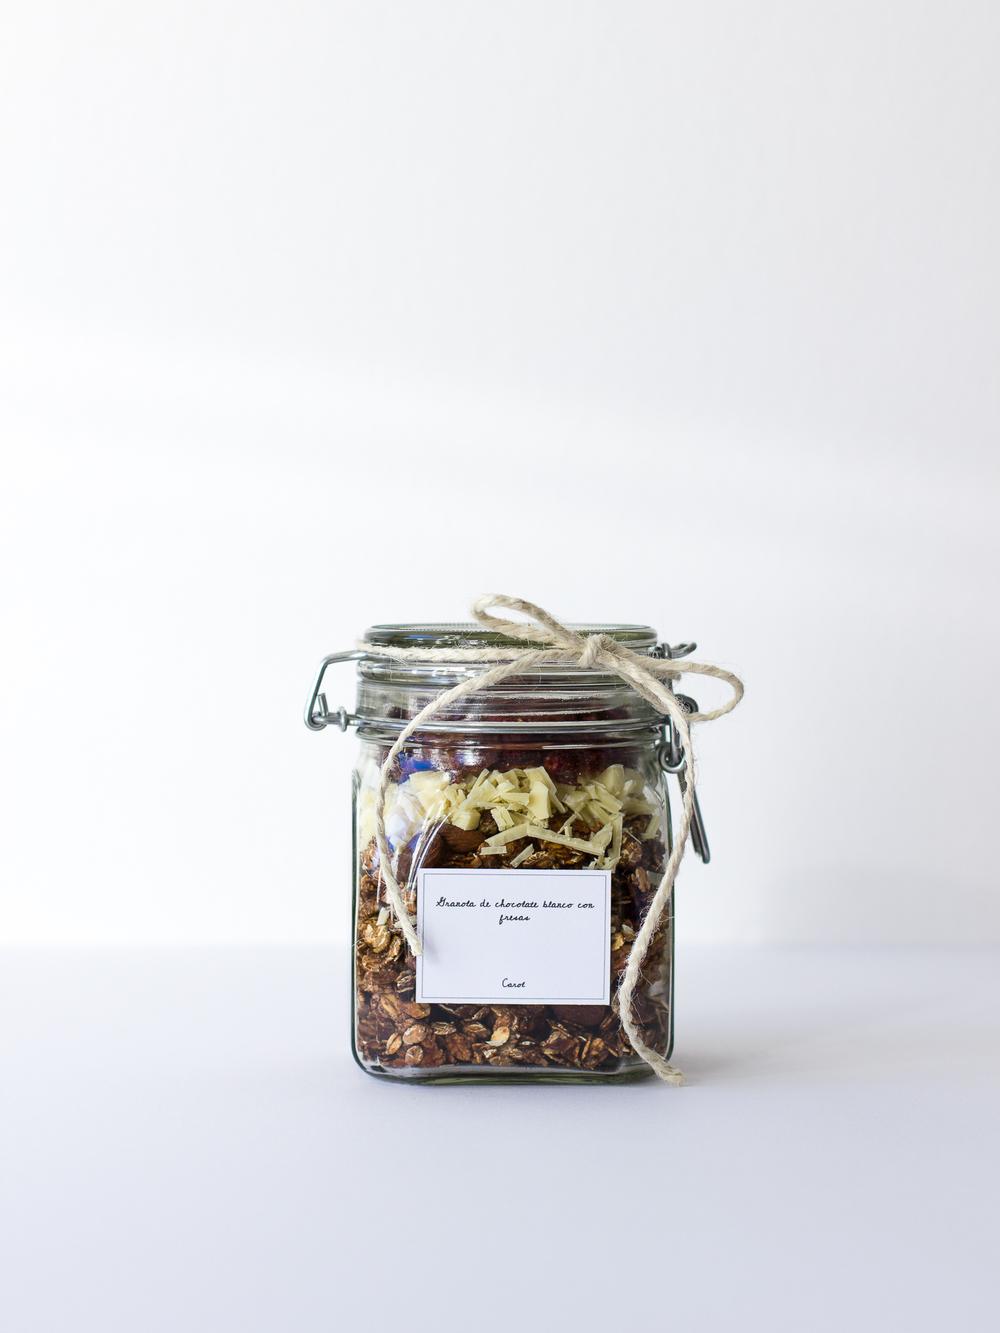 Granola de chocolate blanco con fresas